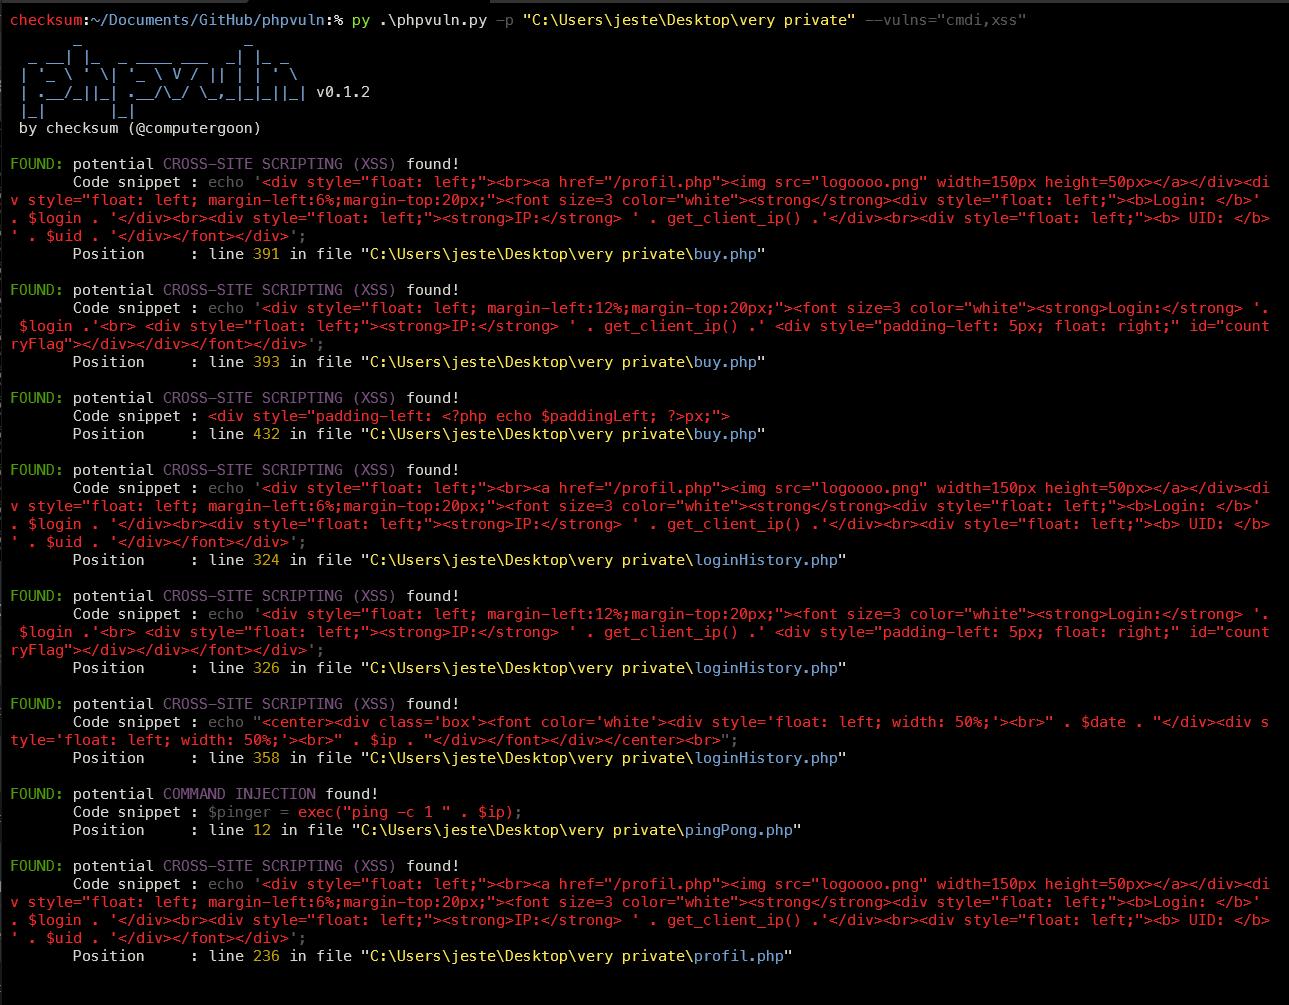 screenshot1 - phpvuln: Εύρεση ευπαθειών σε κώδικα PHP